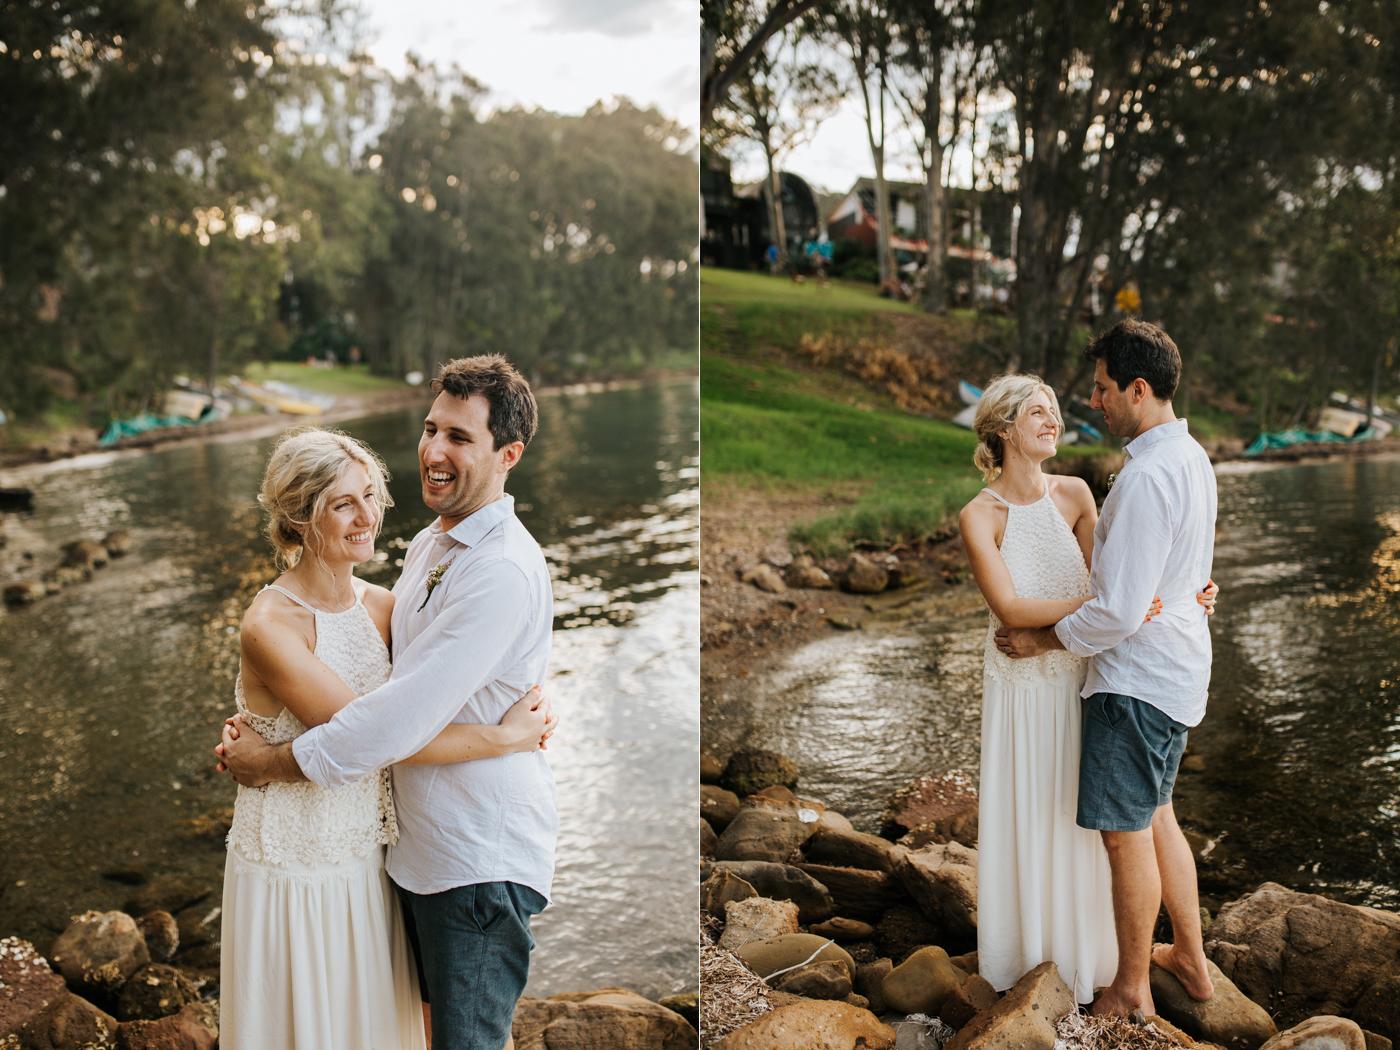 Emma & Ben - Lake Macquarie - Hunter Valley Wedding - Samantha Heather Photography-208.jpg